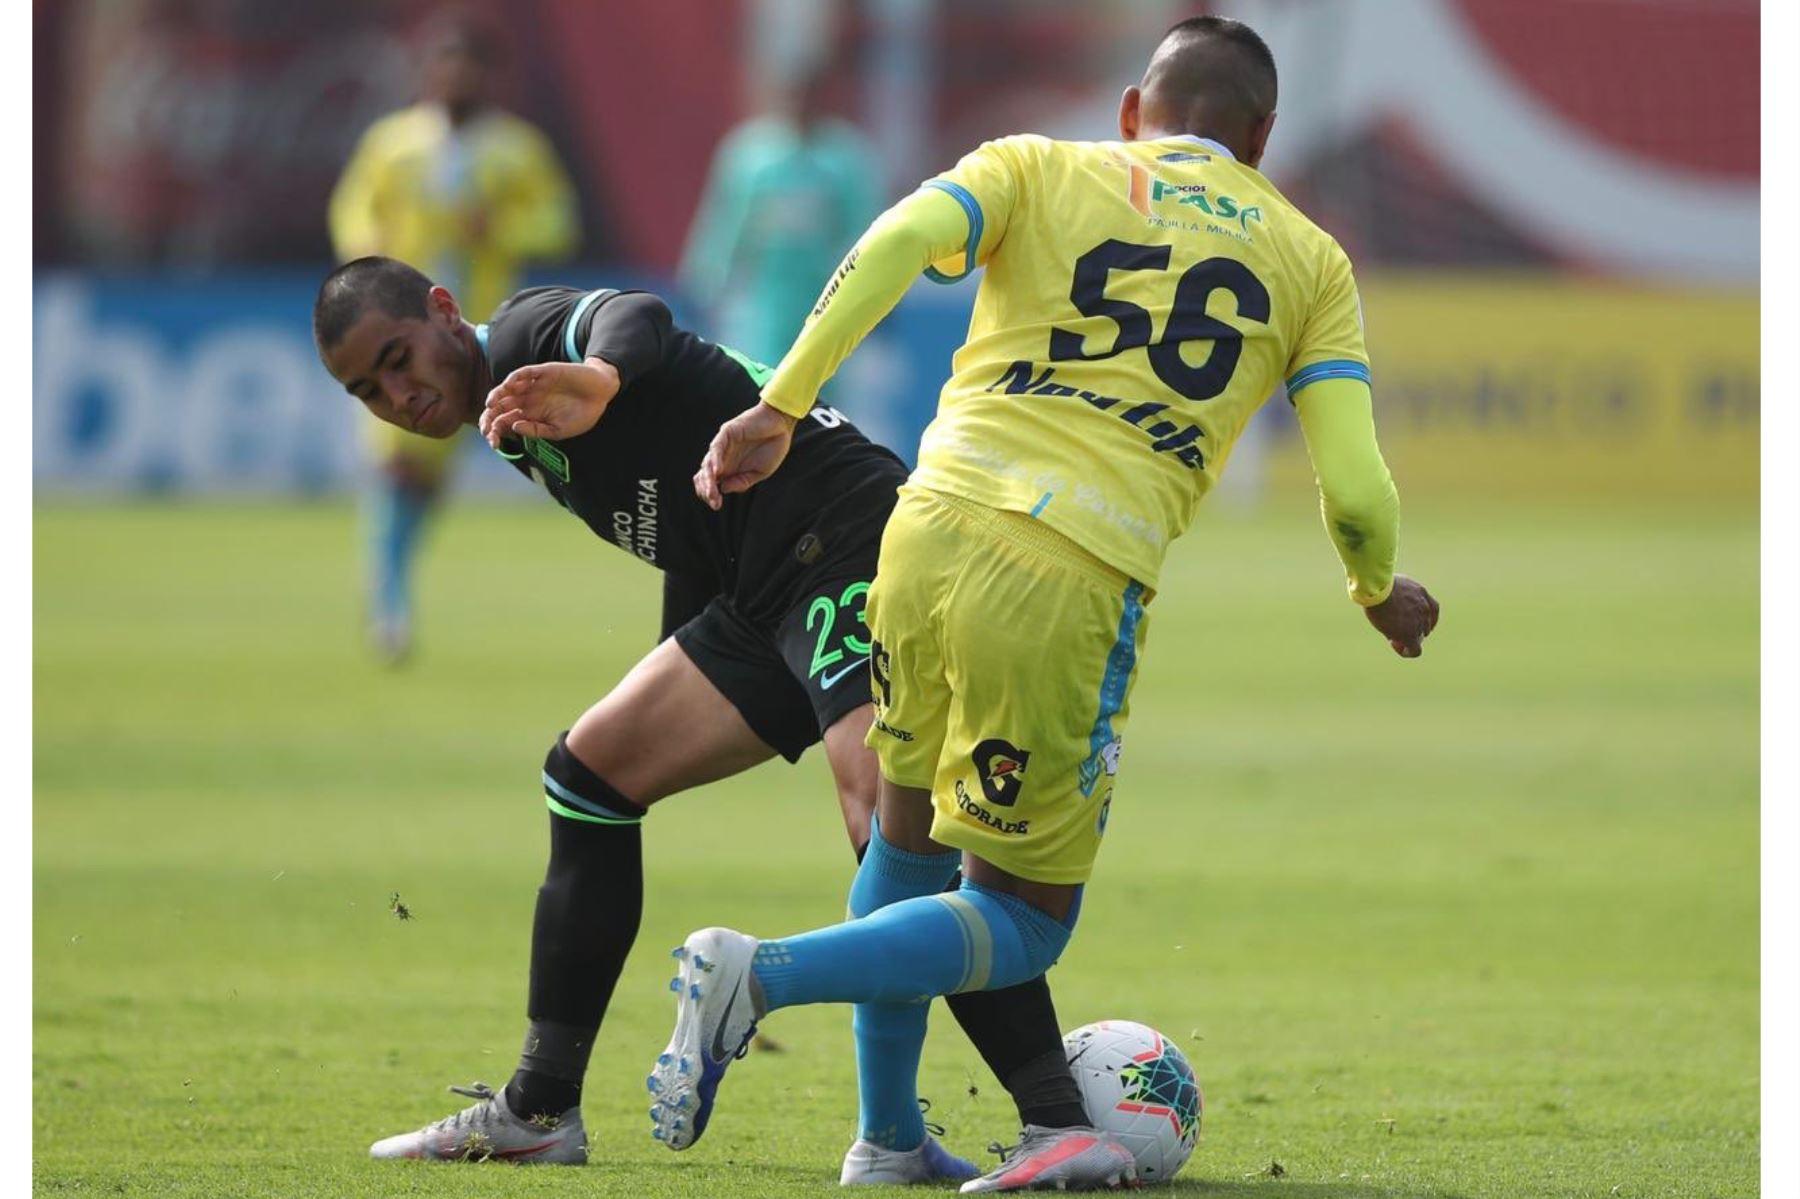 Alianza Lima  y el club Carlos Stein  se enfrentan por la fecha 14 del Torneo Apertura, en la Videna FPF.  Foto: @LigaFutProf